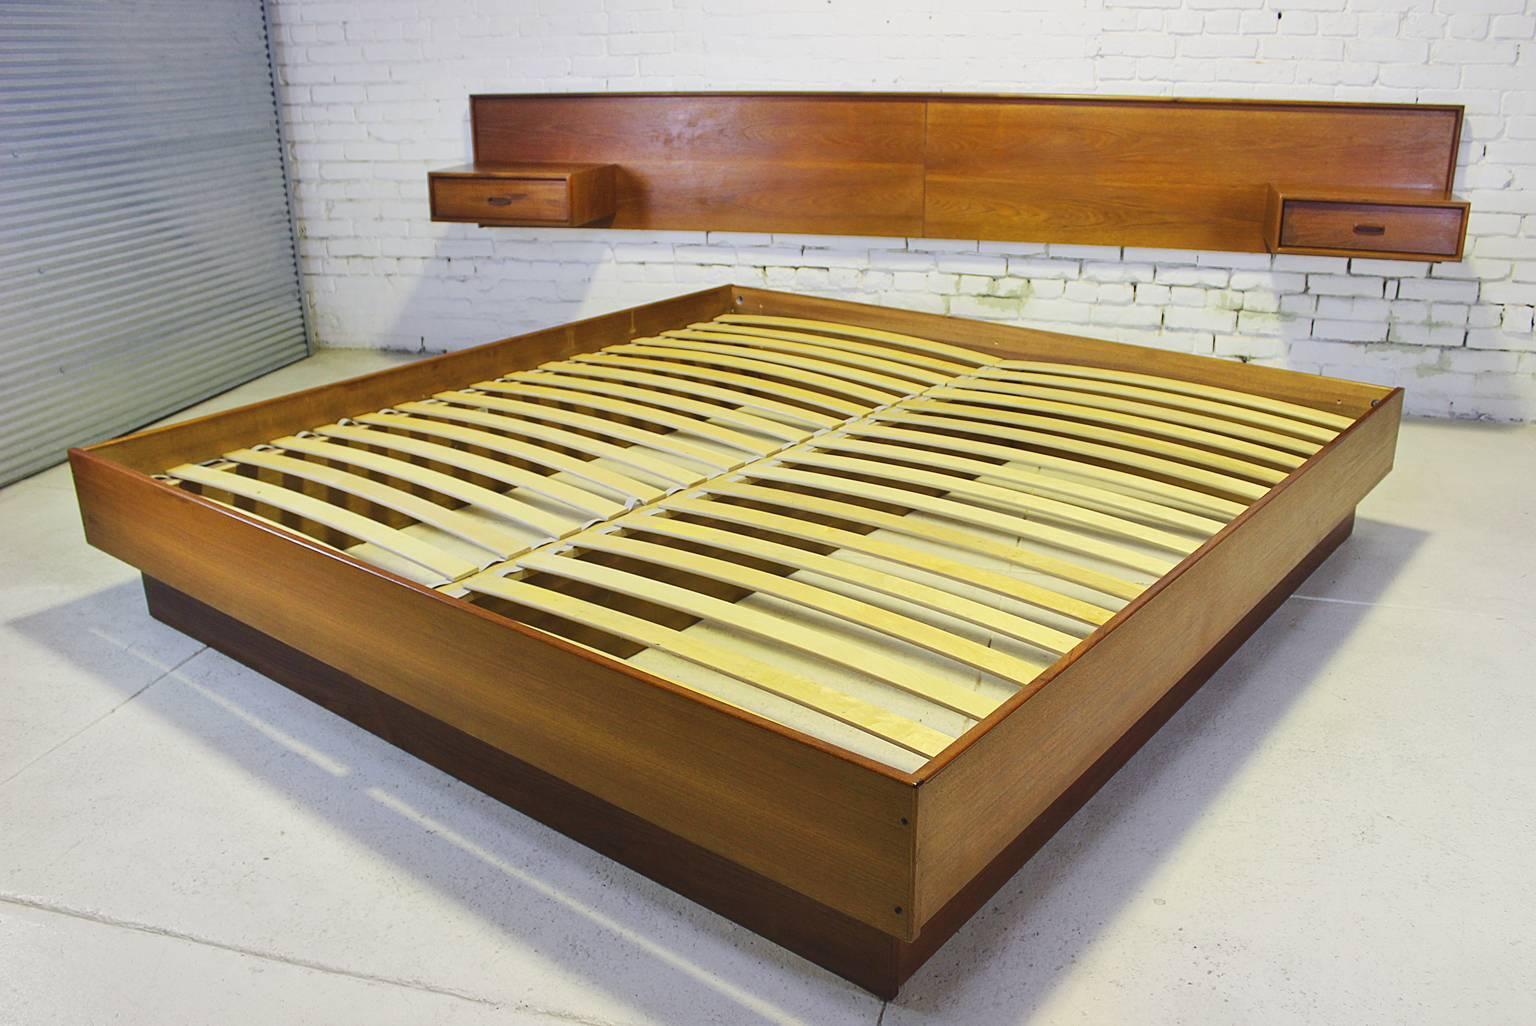 Vintage Scandinavian Modern Teak King Platform Bed With Attached Nightstands At 1stdibs